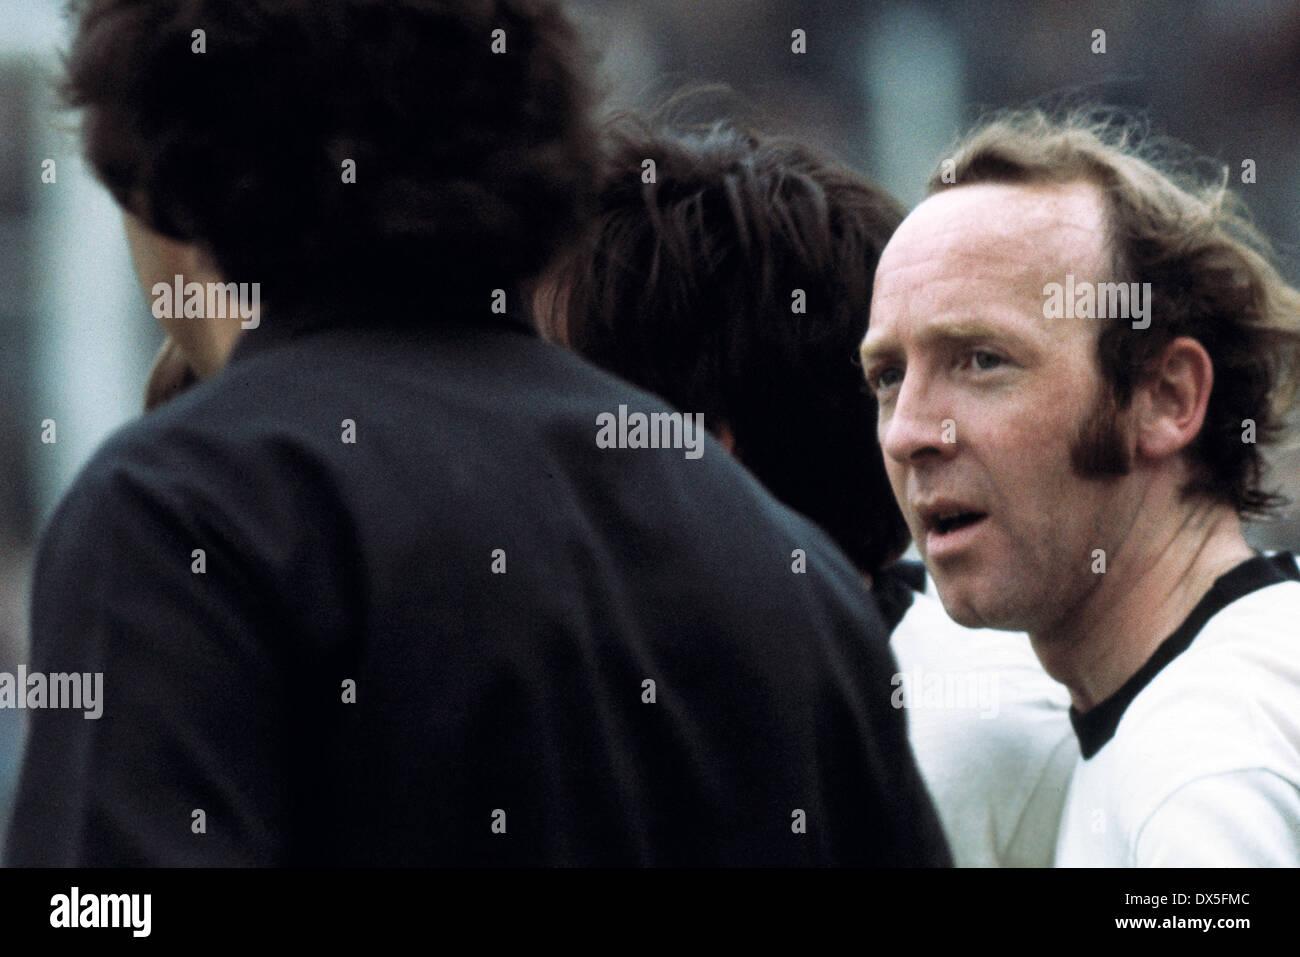 football, 2. Bundesliga Nord, 1974/1975, Stadium am Uhlenkrug, ETB Schwarz Weiss Essen versus FC Bayer 05 Uerdingen 1:2, after the game Horst Gecks (ETB) is frustrated - Stock Image